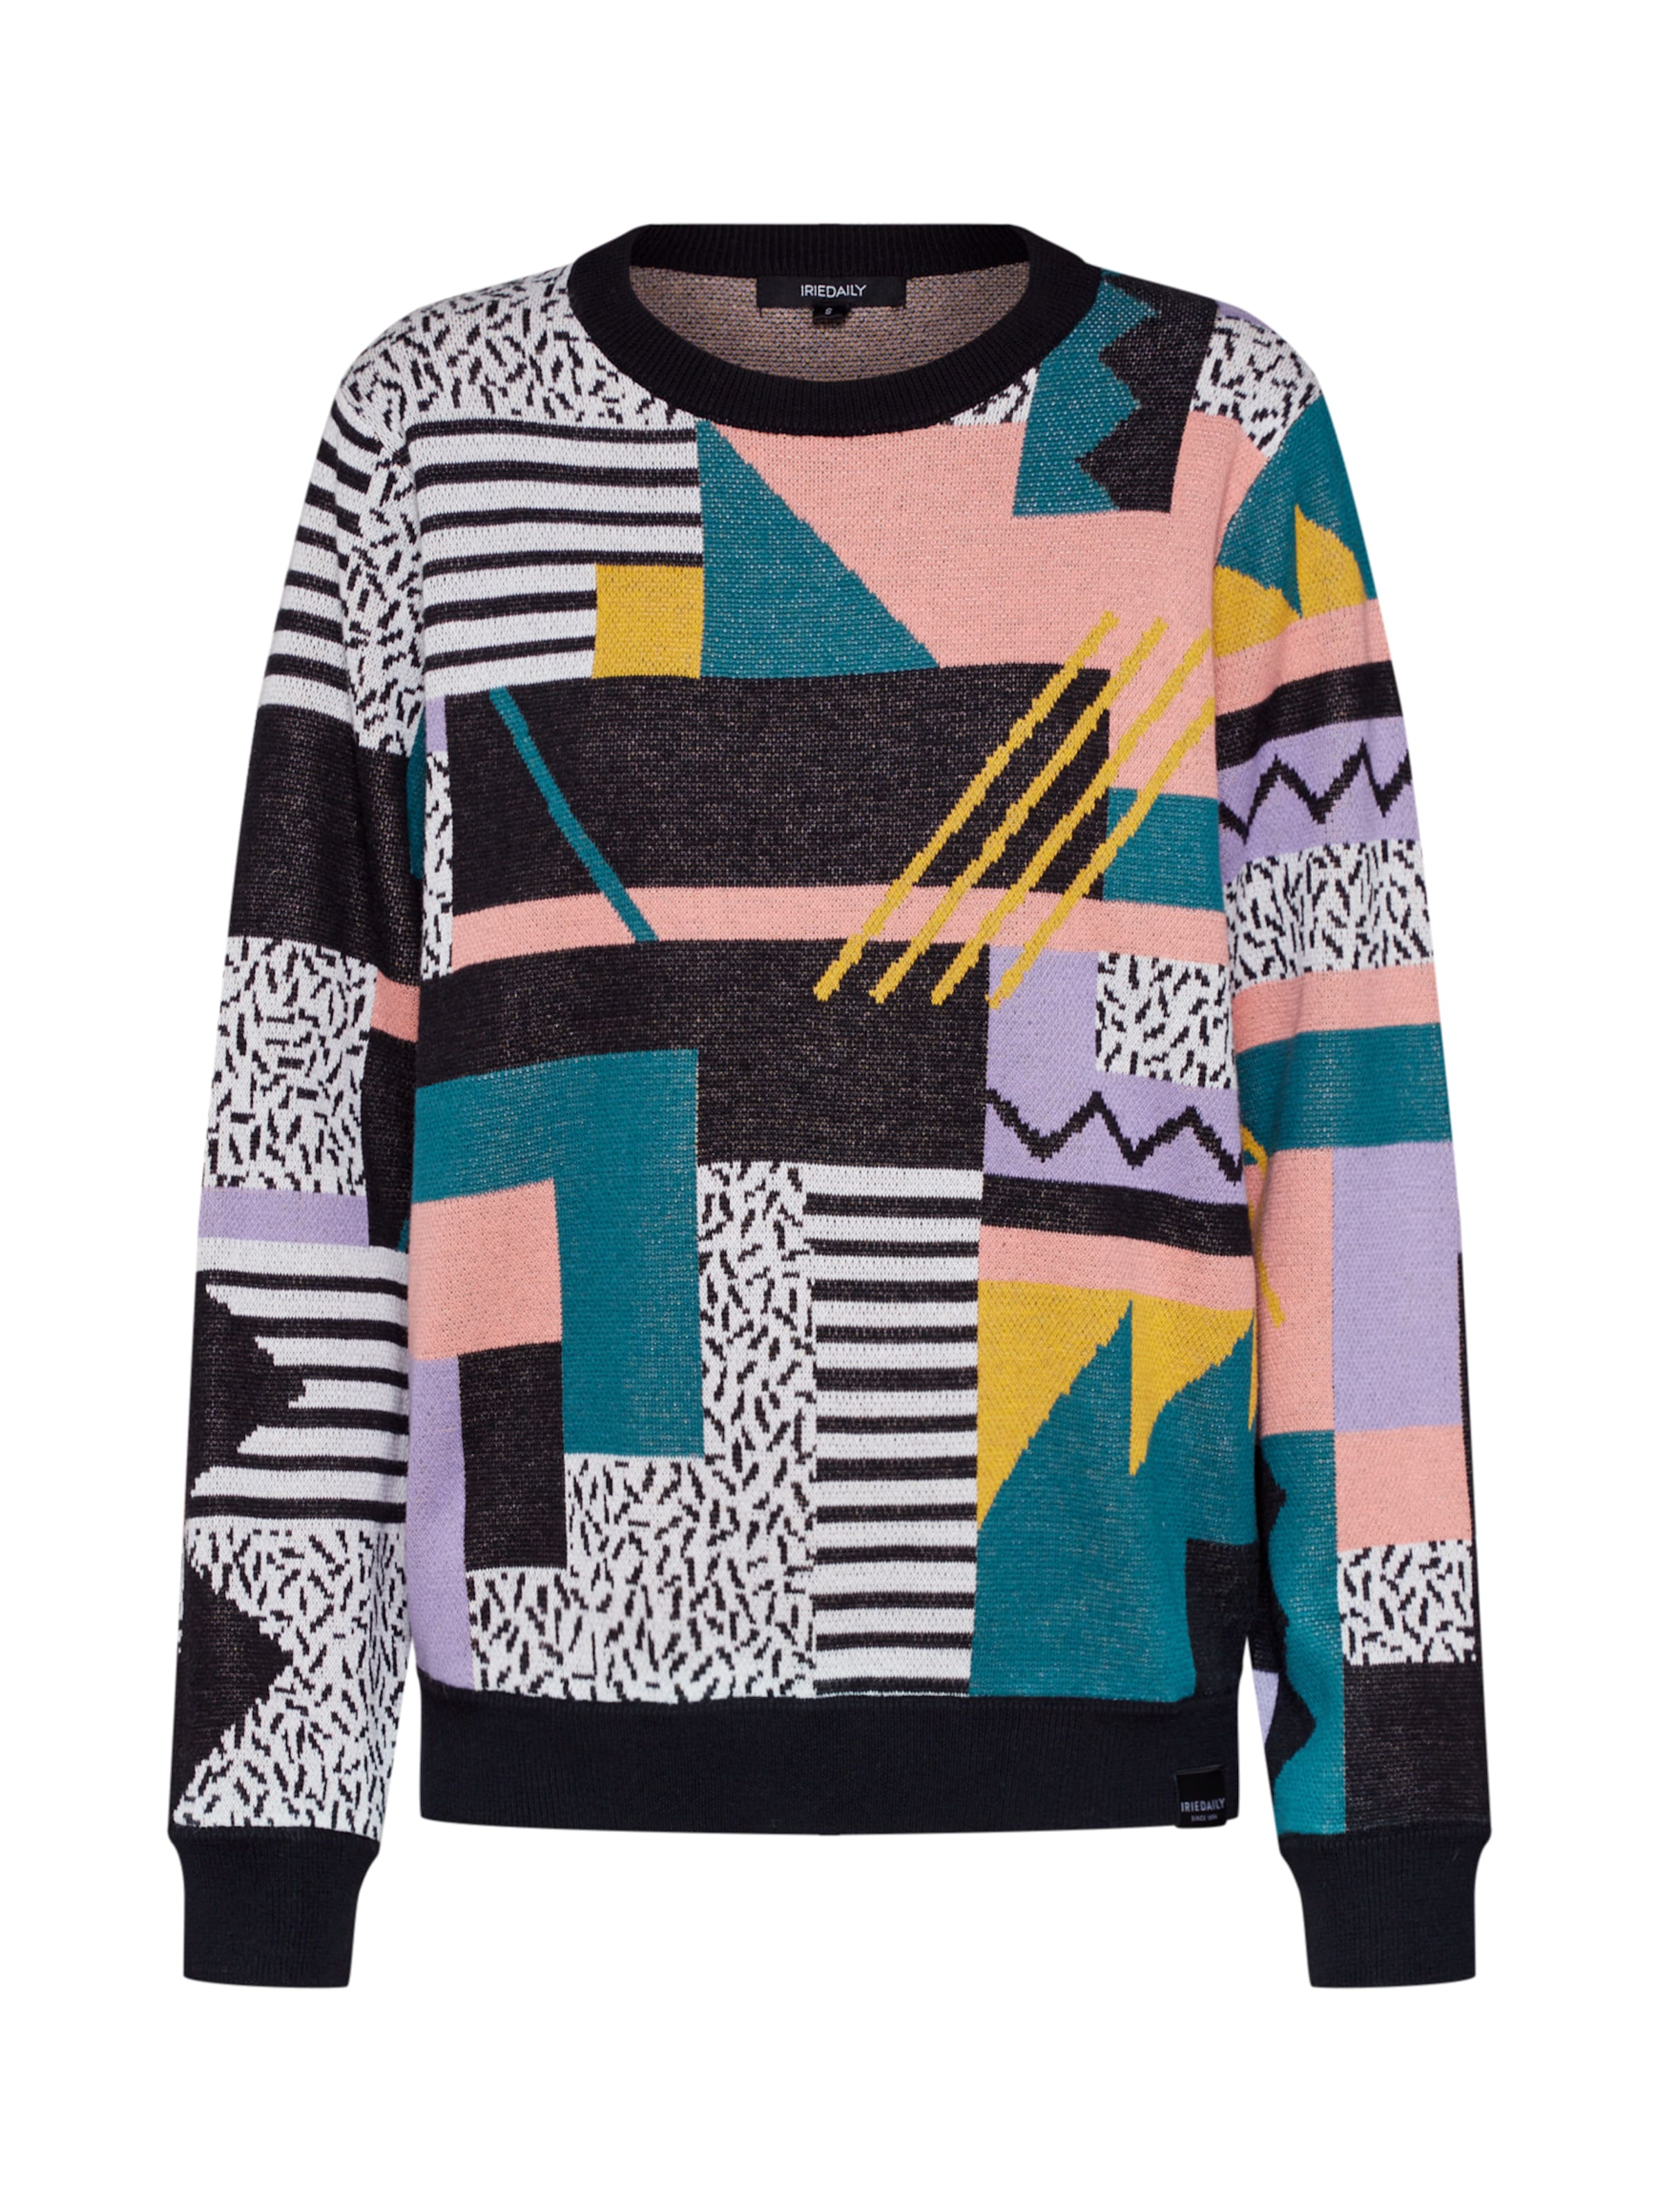 Iriedaily Pullover Knit' In Mischfarben 'rudy stCxhQrd